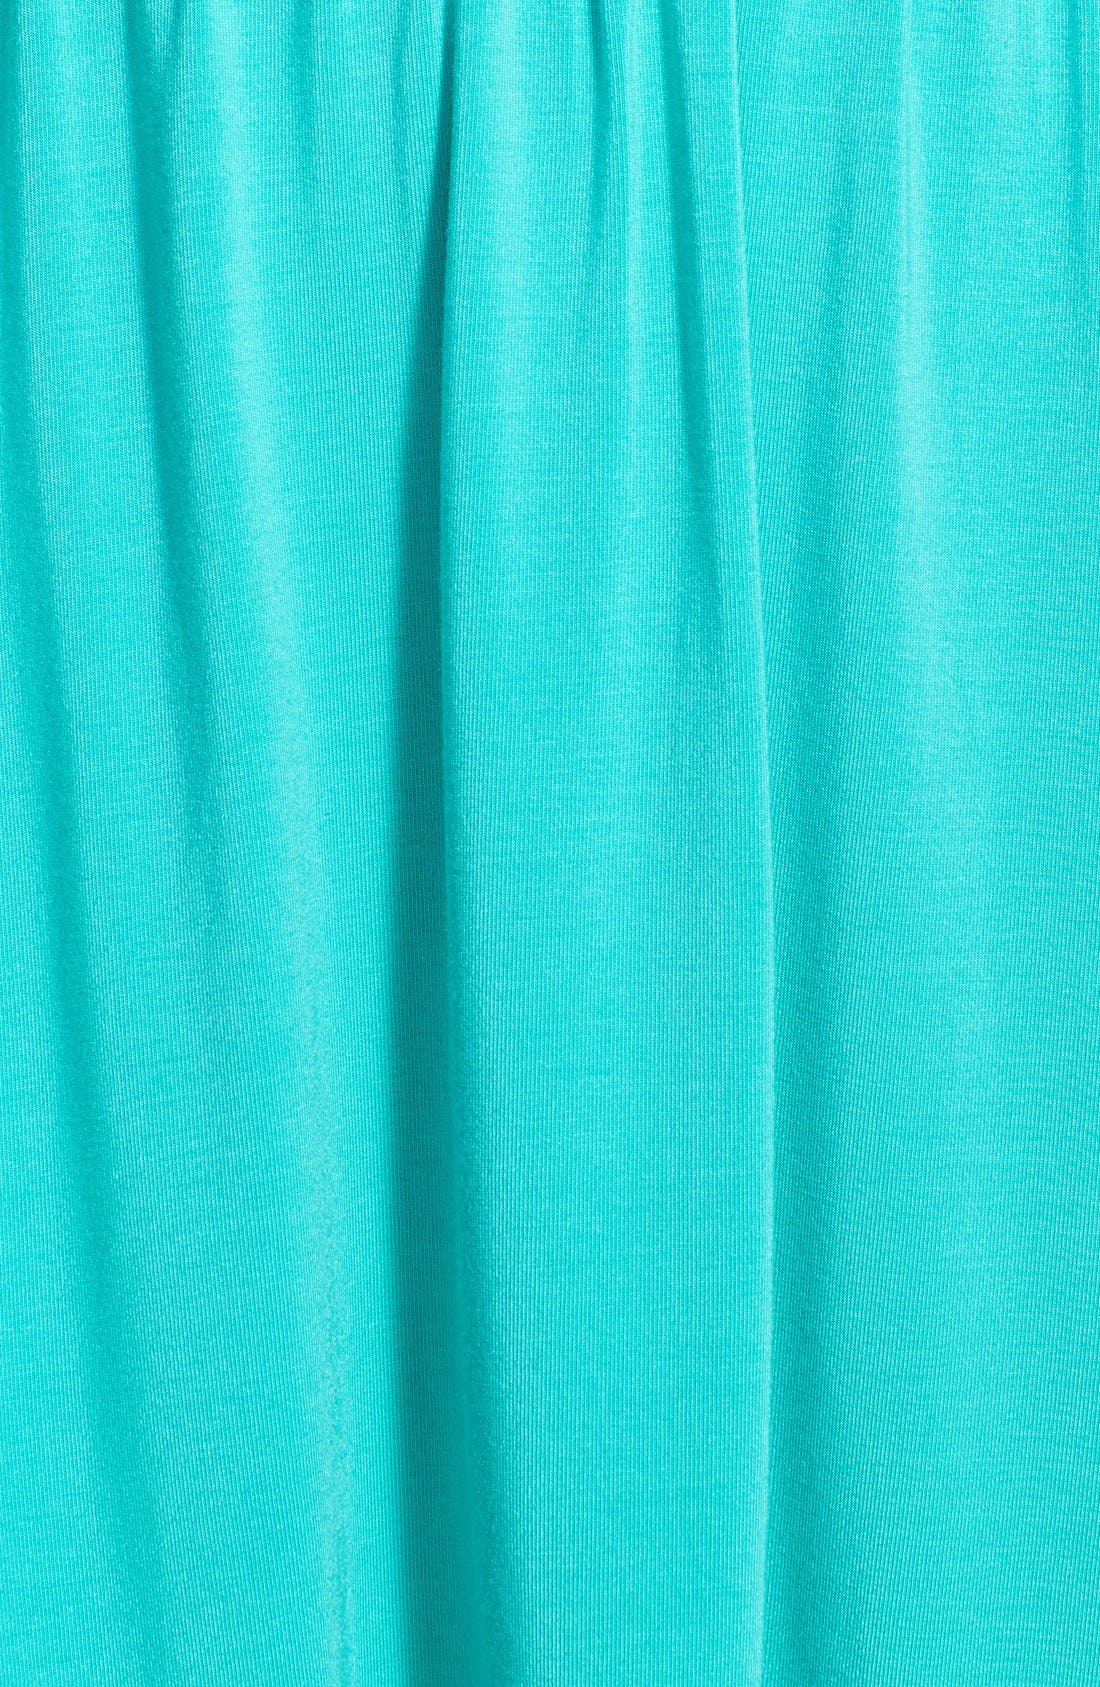 Alternate Image 3  - Tart 'Elsie' Jersey Fit & Flare Dress